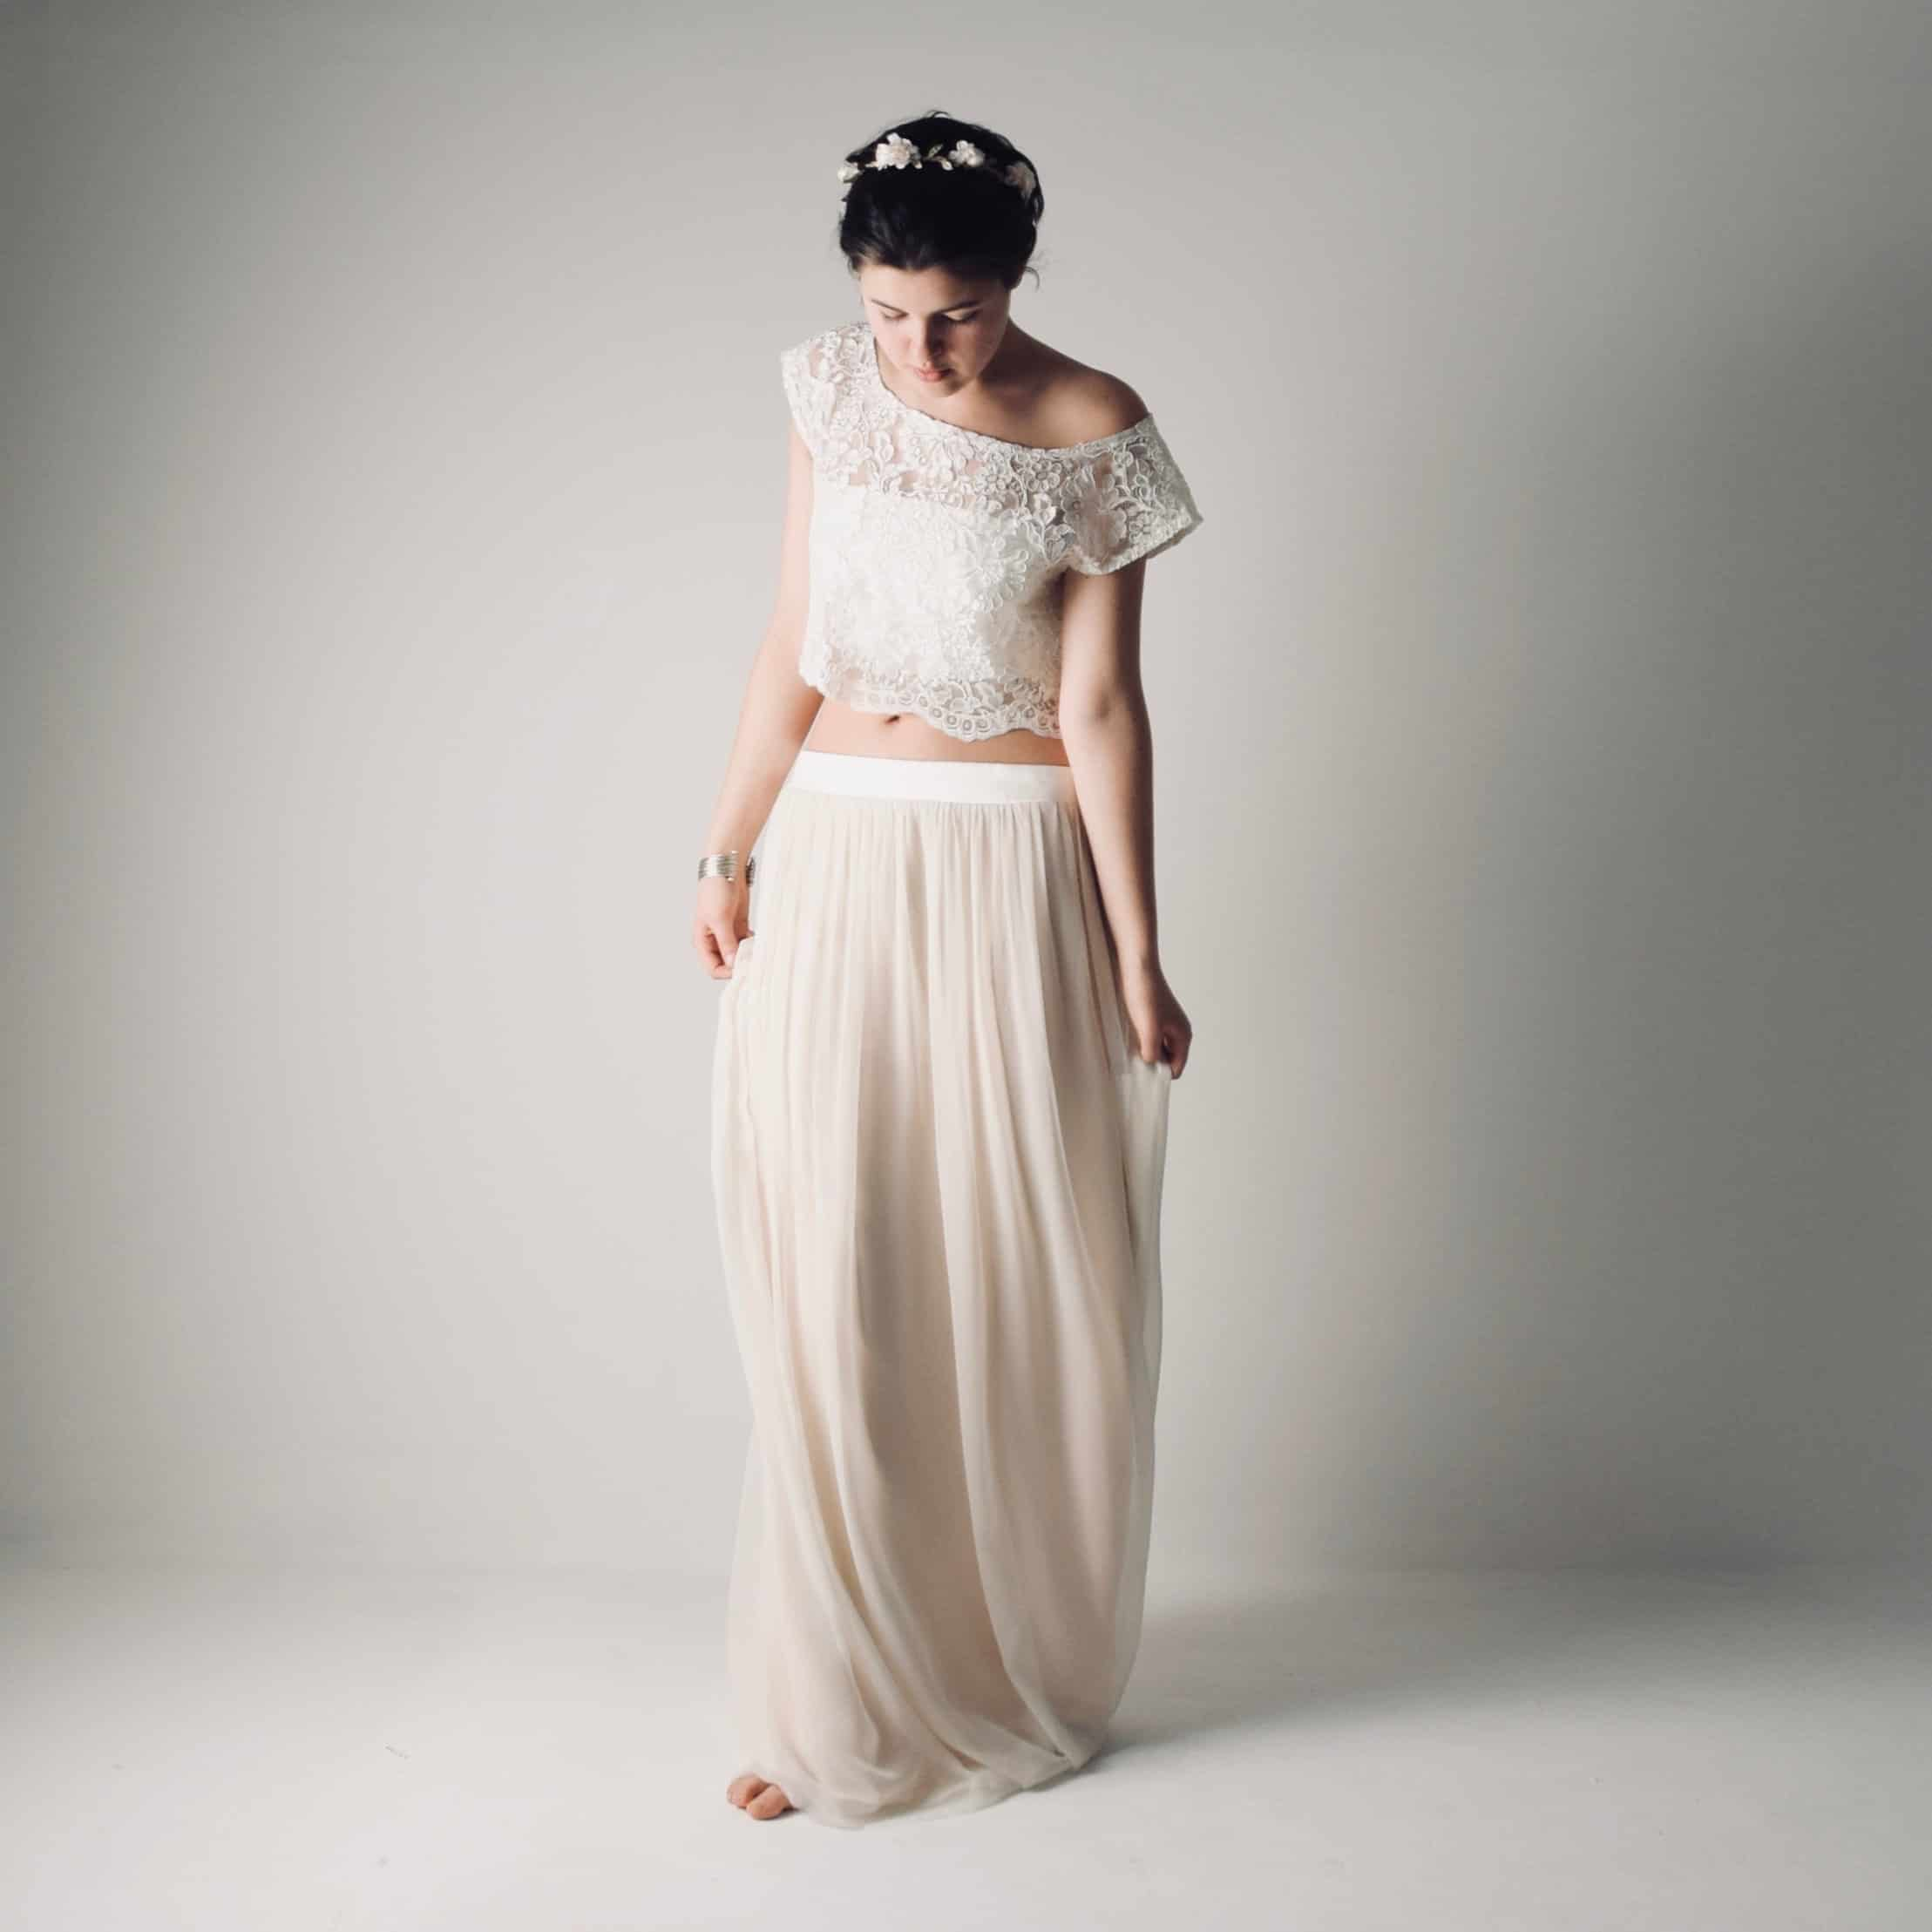 d63273816bda Fennel ~ Boho wedding dress separates ~ Hippie bridal outfit, Larimeloom